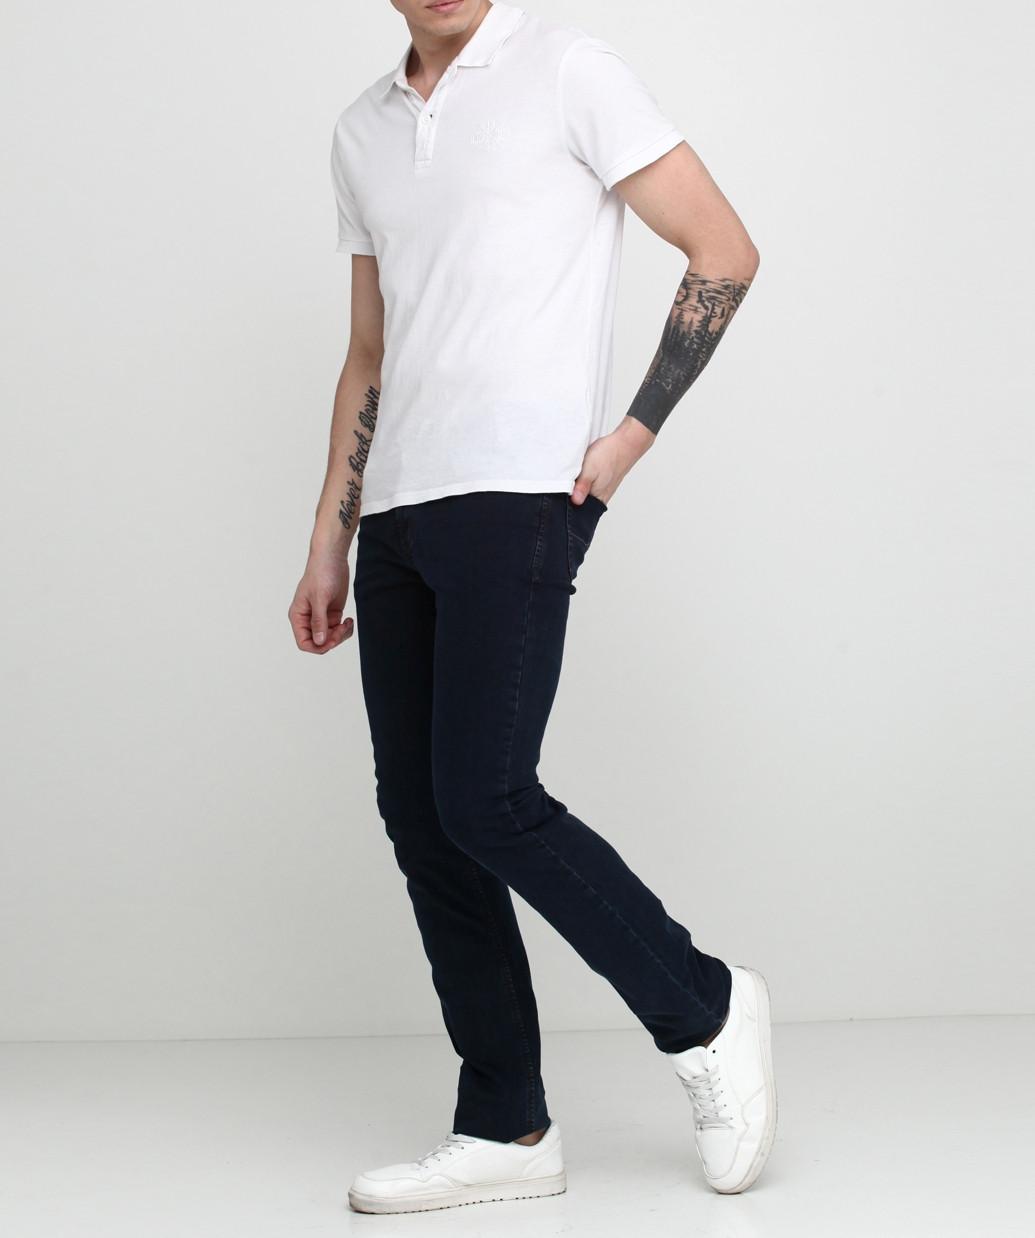 Мужские джинсы Pioneer 30/34 Синий (P-8-013), фото 1